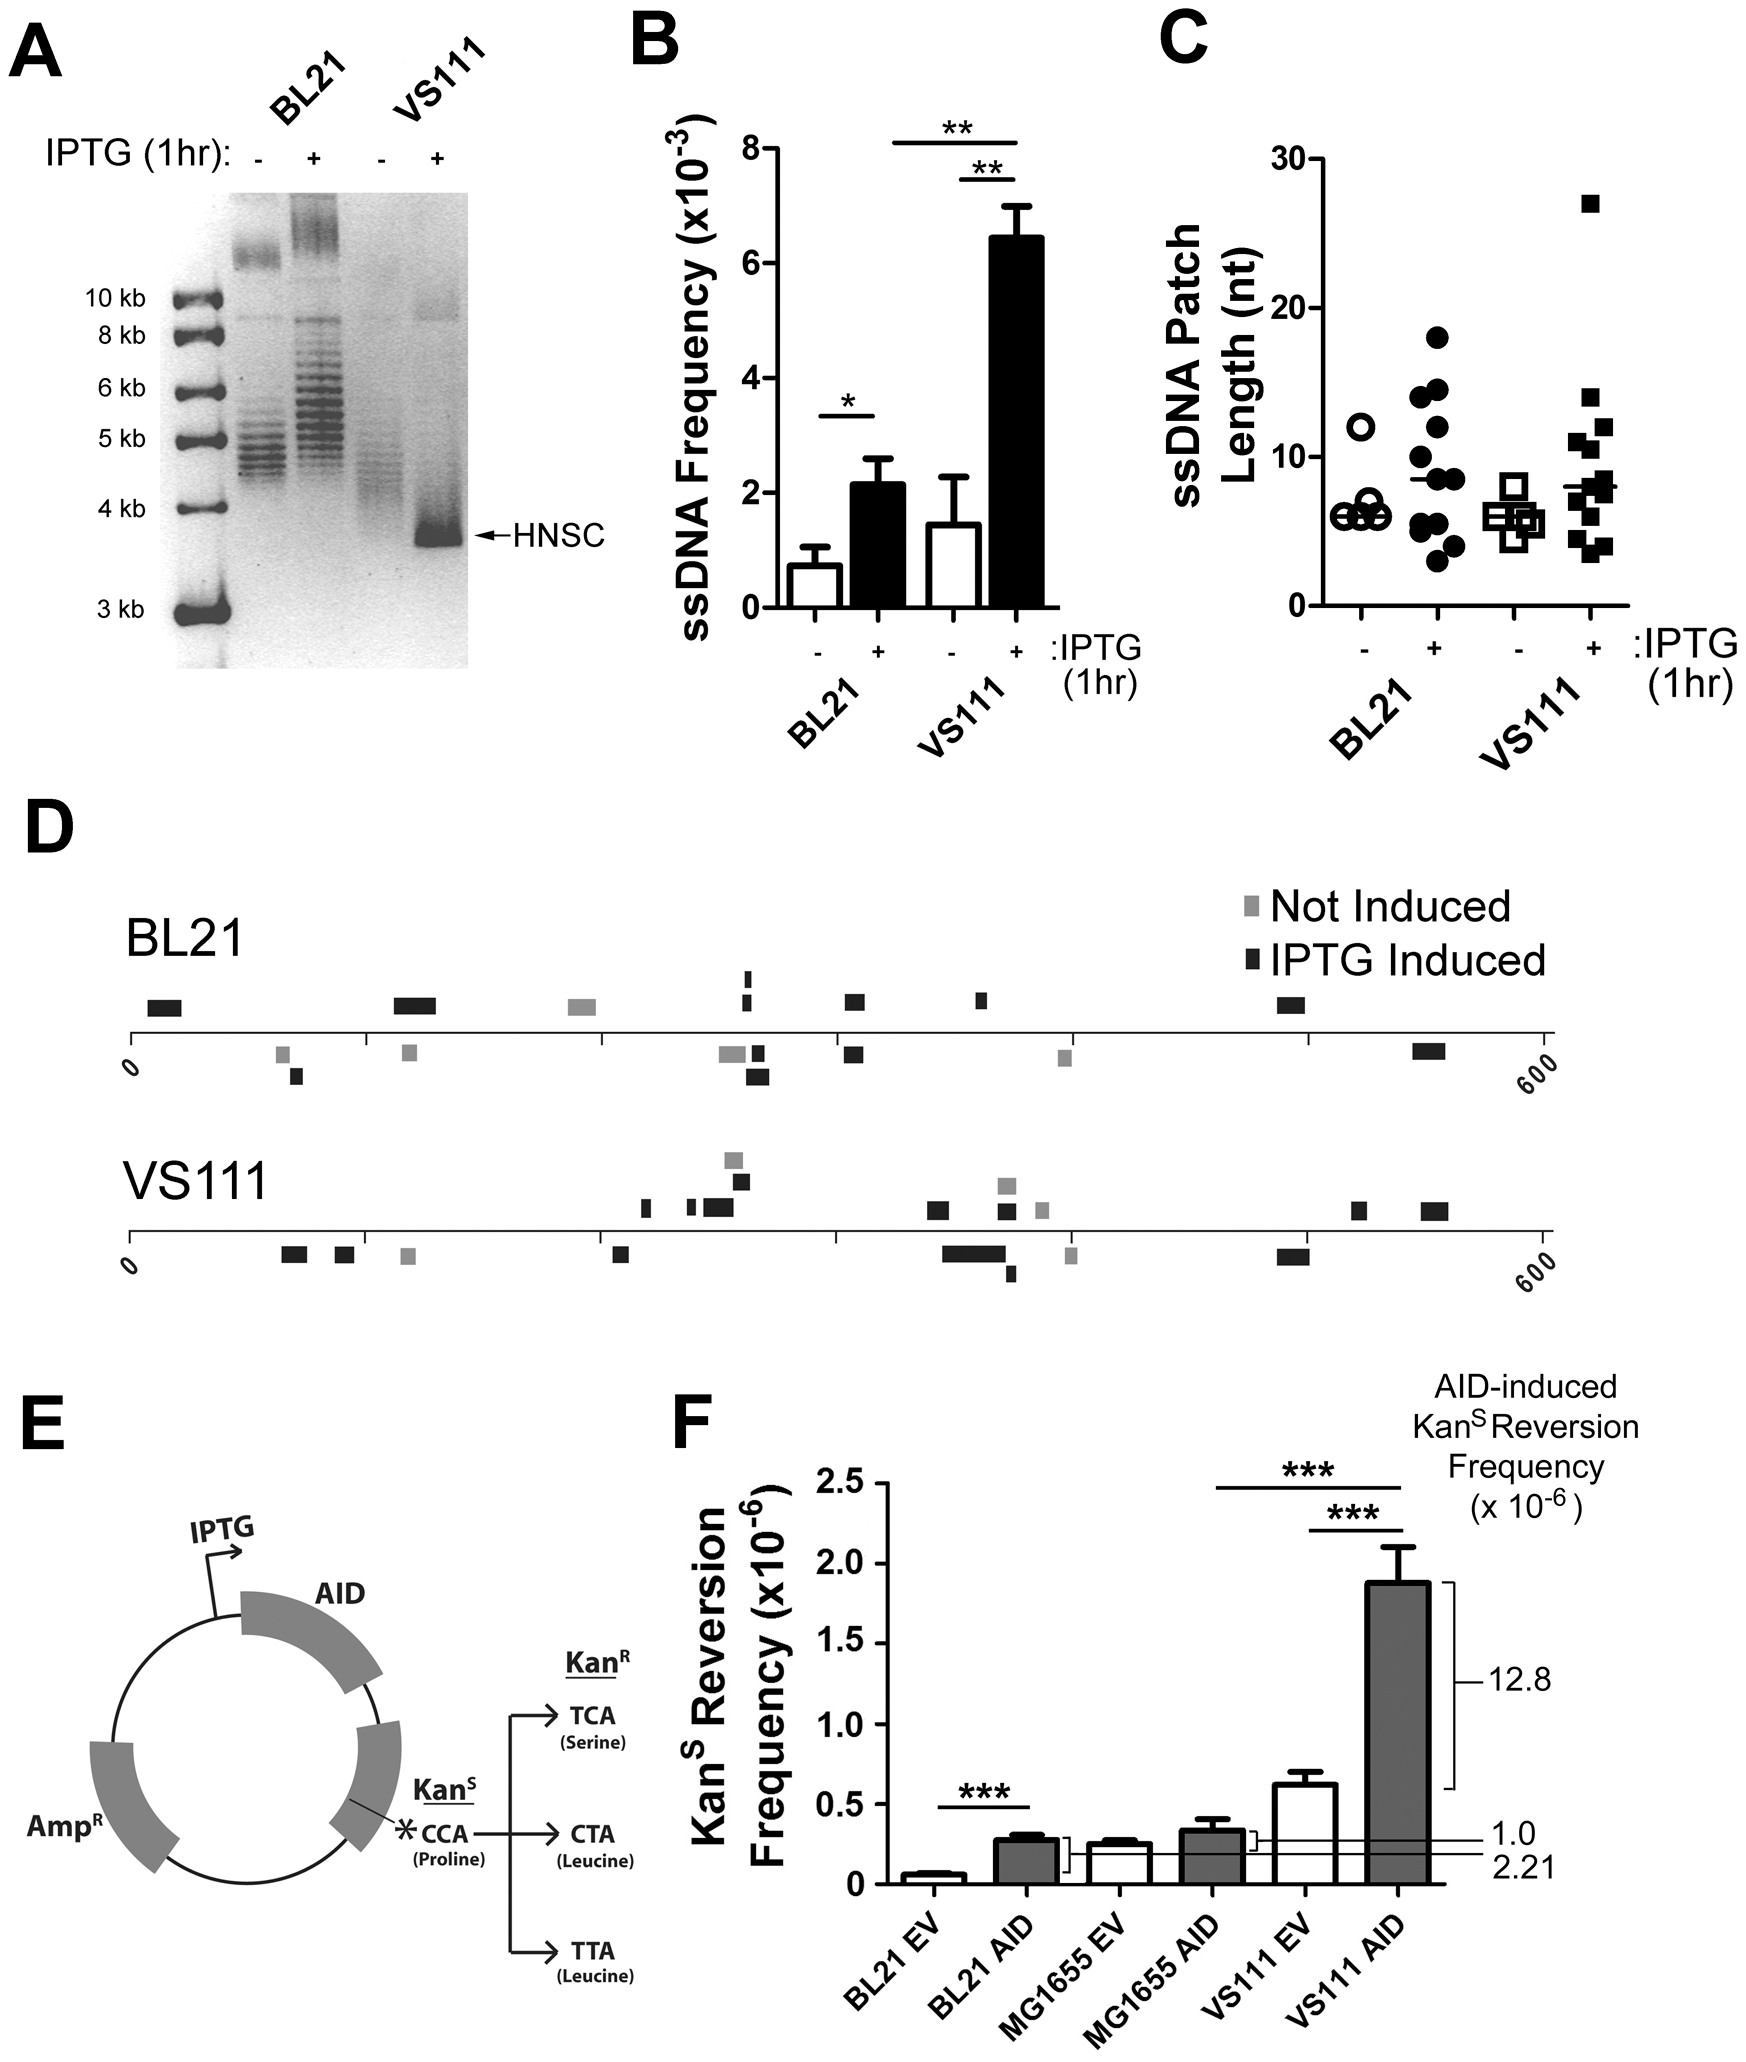 ssDNA Patch Formation and Negative Supercoiling in <i>E. coli</i>: Wild-Type BL21(DE3) versus TopA Deficient VS111(DE3).